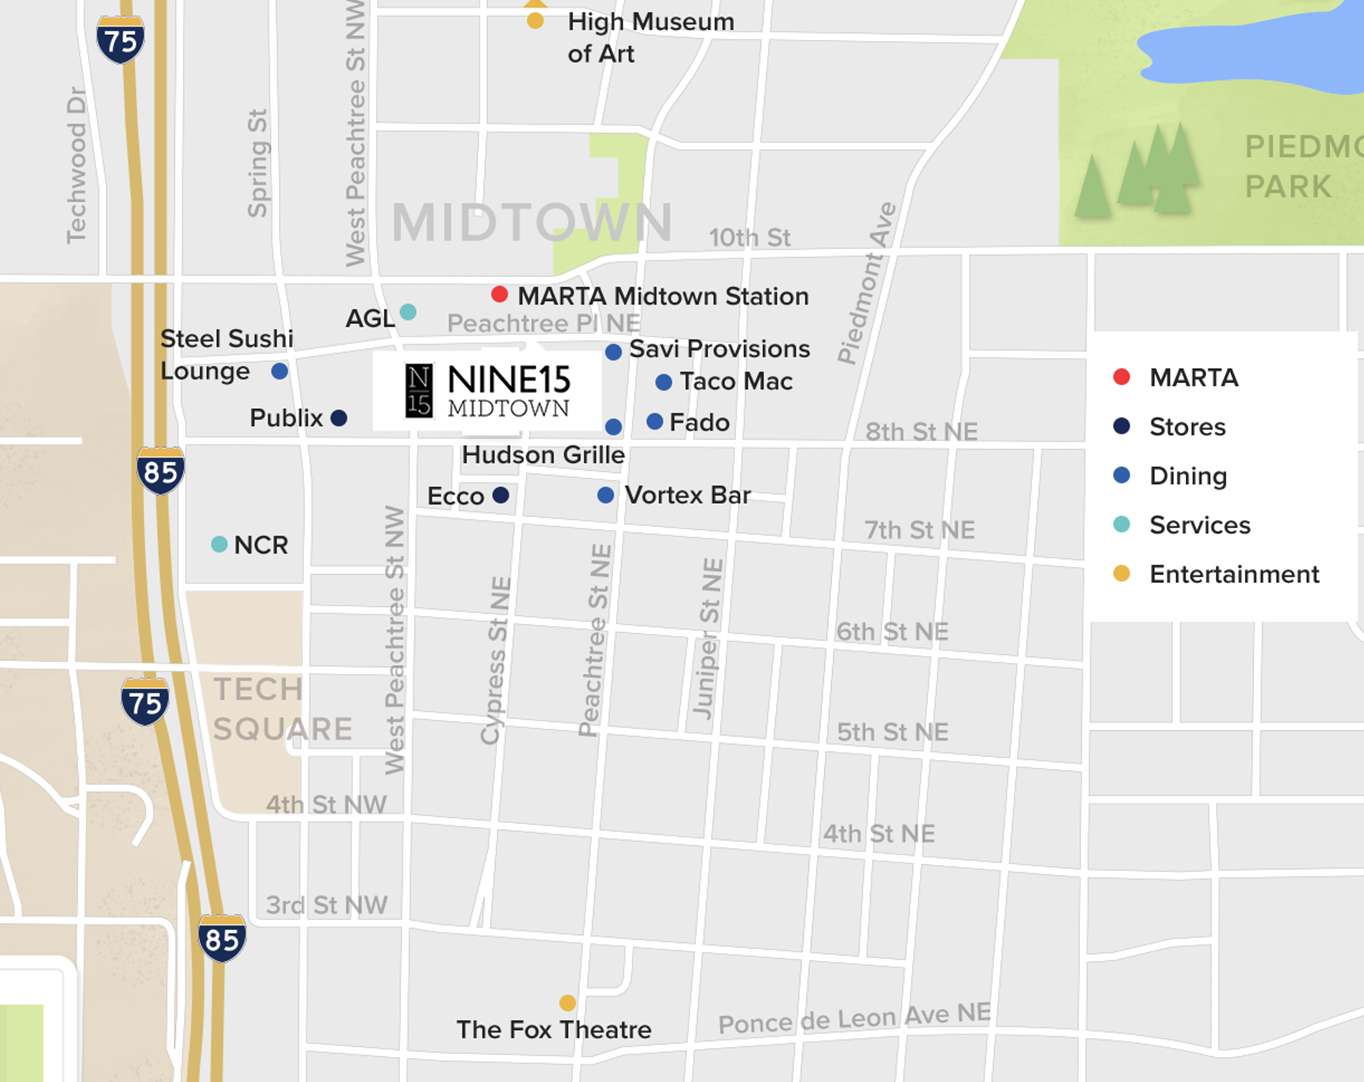 Midtown Atlanta Map and Attractions | Nine15 Midtown